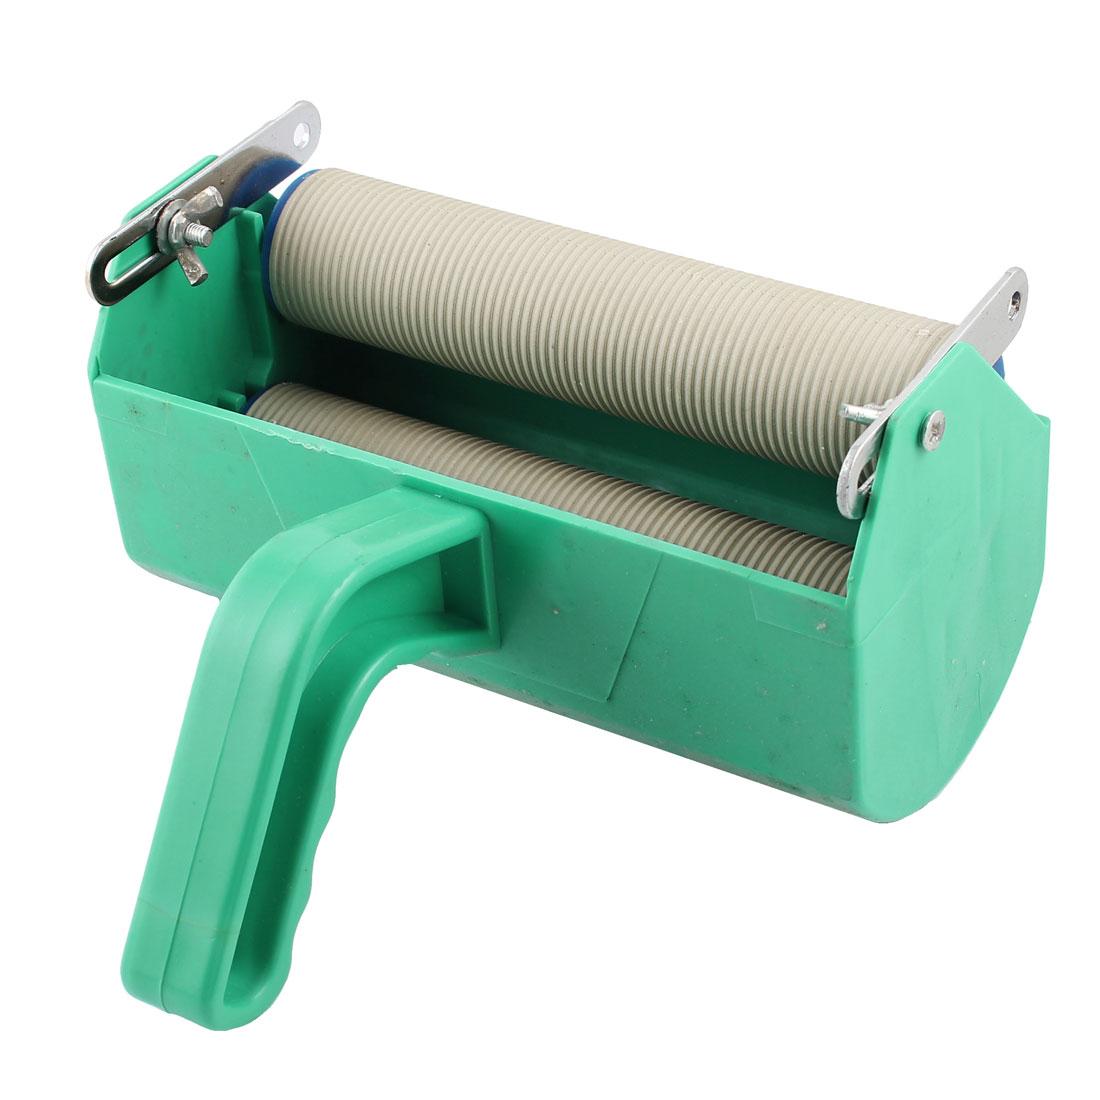 DIY-Applicator-Decor-Wall-Paint-7-Brush-Roller-Decorating-Machine